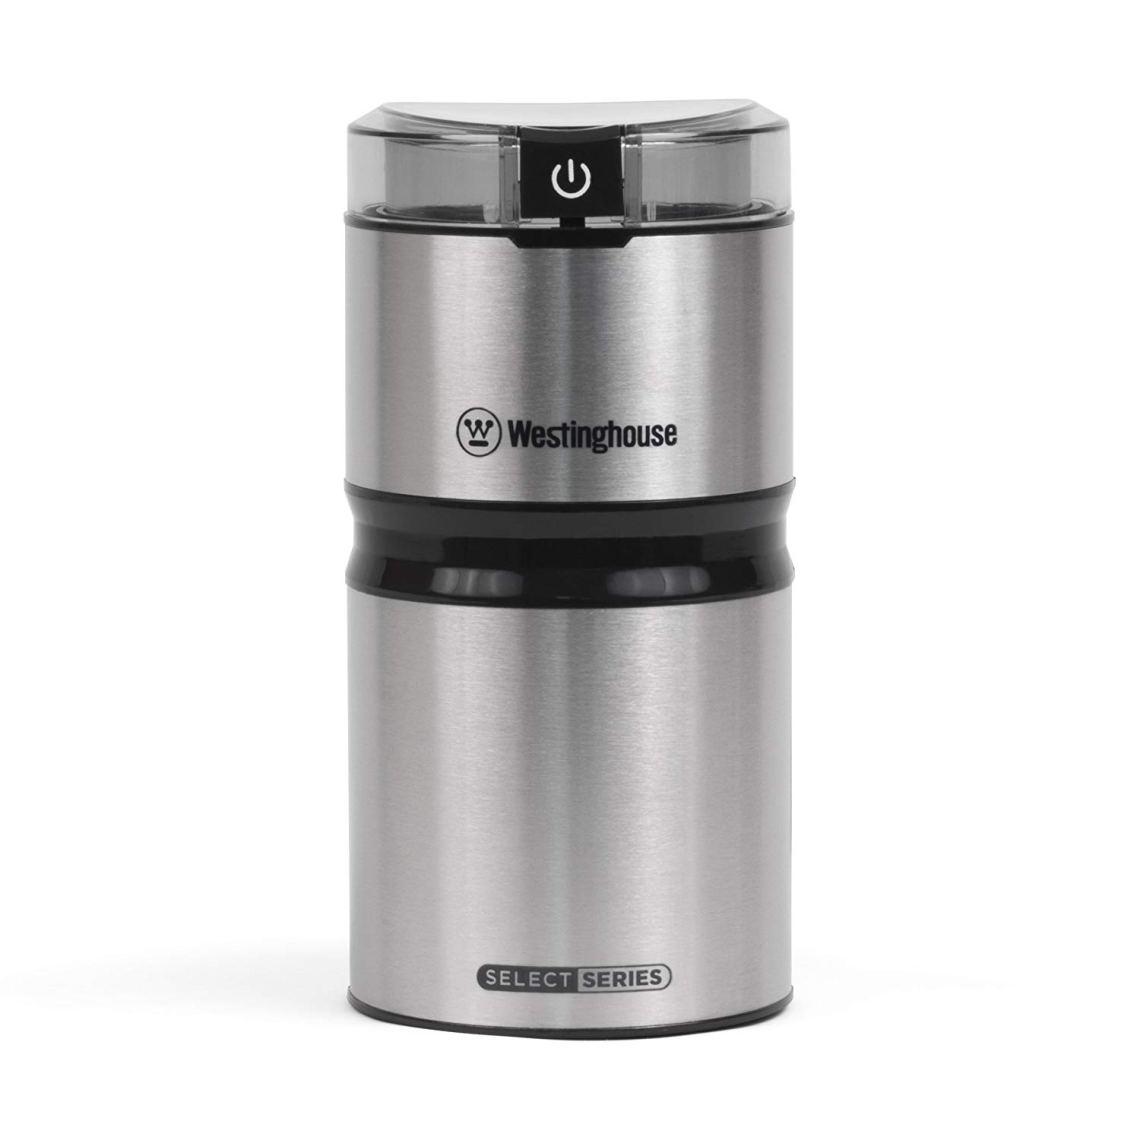 Westinghouse-coffee-spice-Grinder